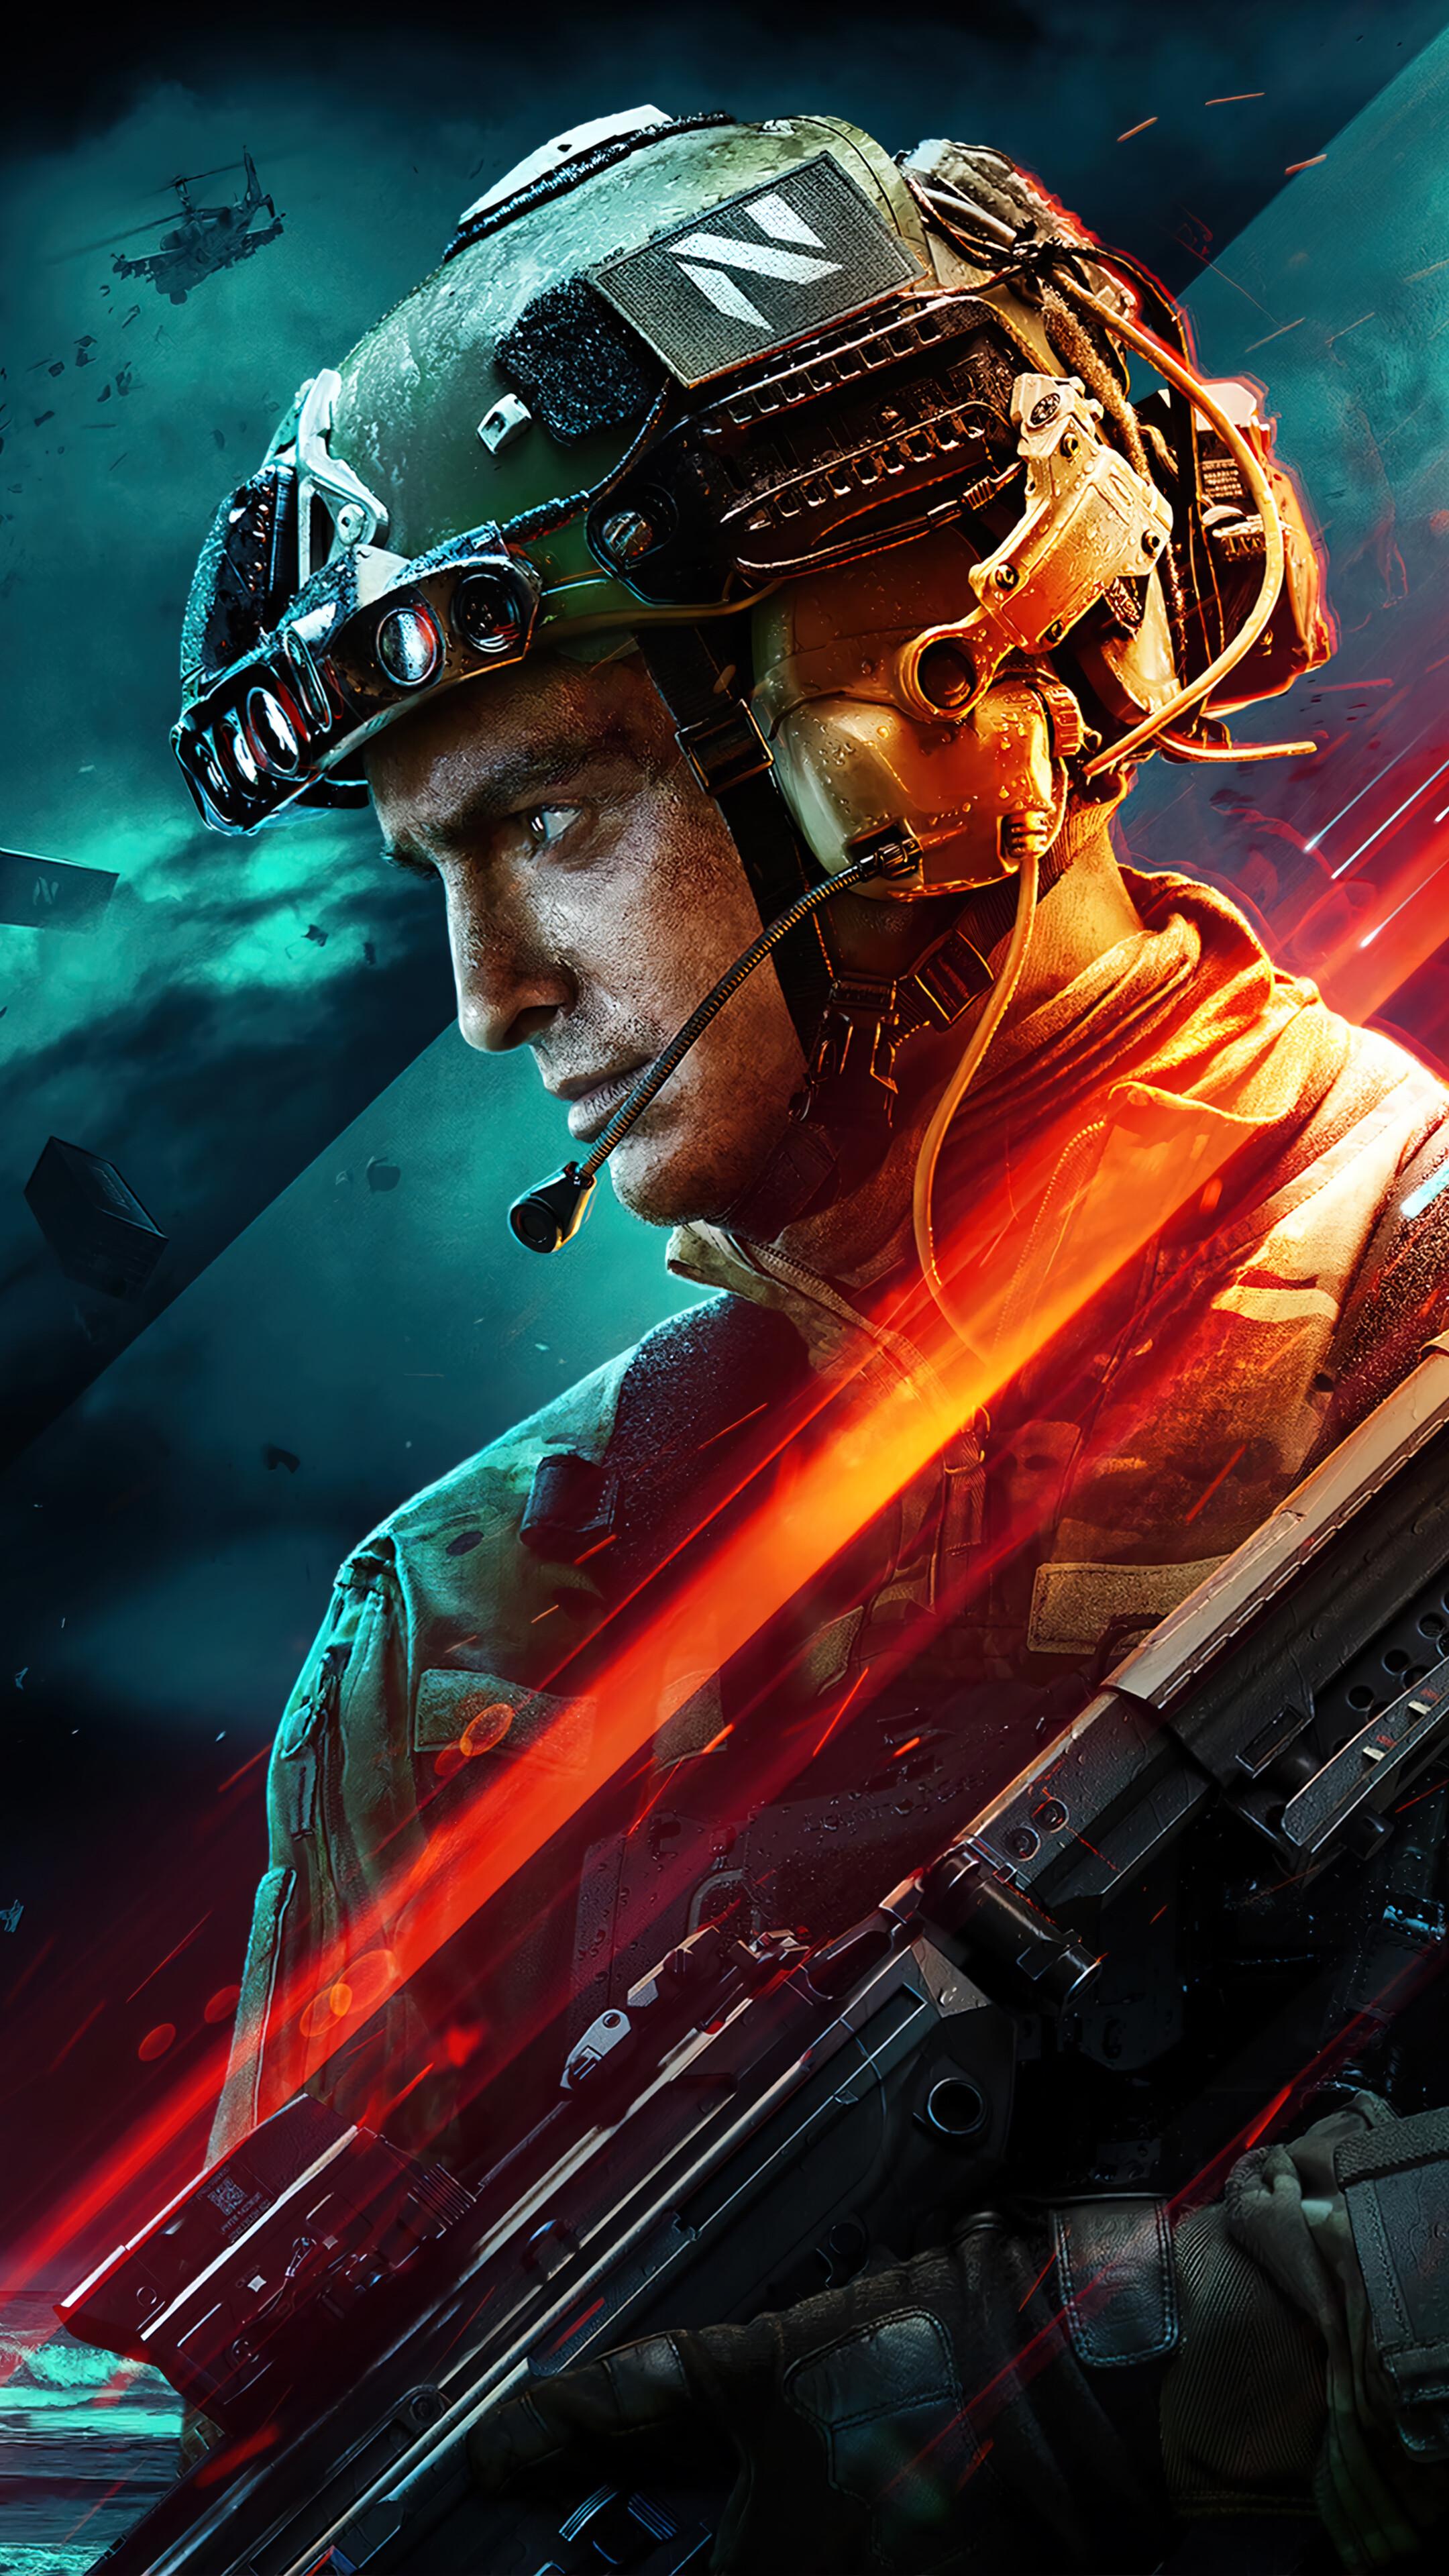 Battlefield 2042 Wallpaper 4K PC Desktop 4591a 2160x3840